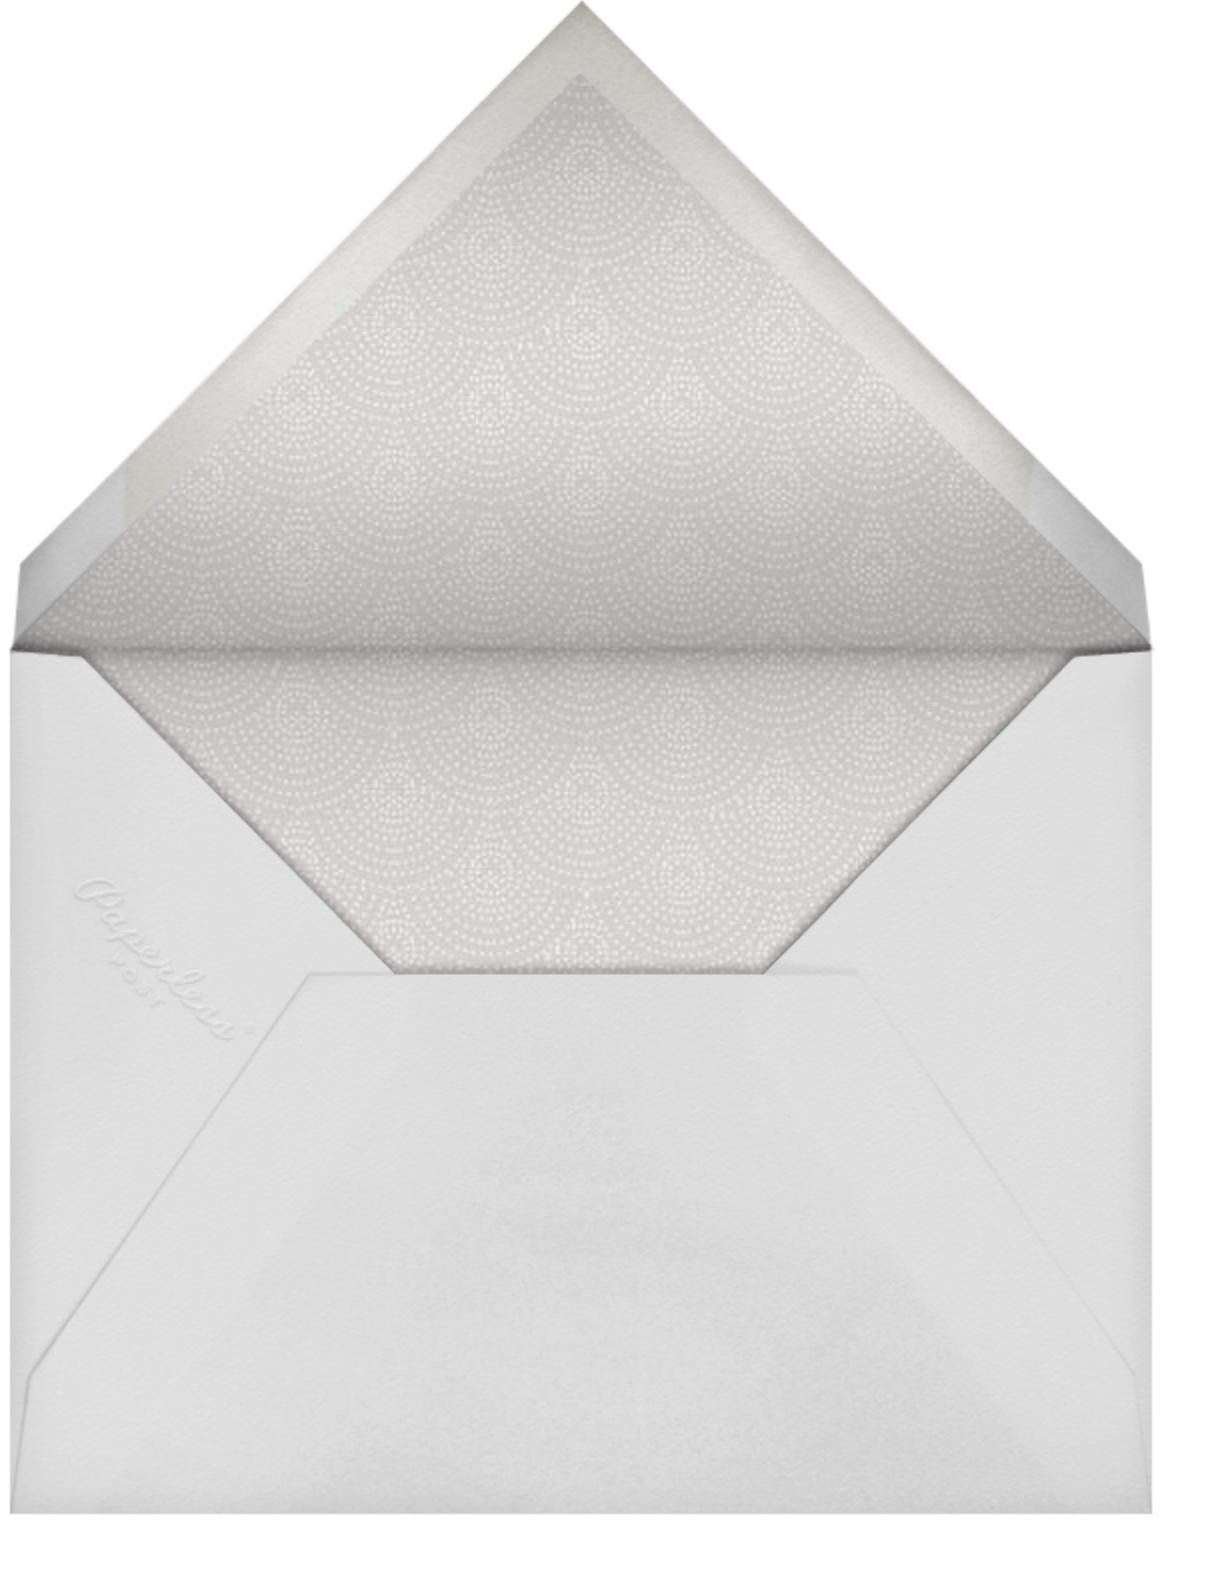 Ikat - Spring Rain/Oyster - Paperless Post - Envelope